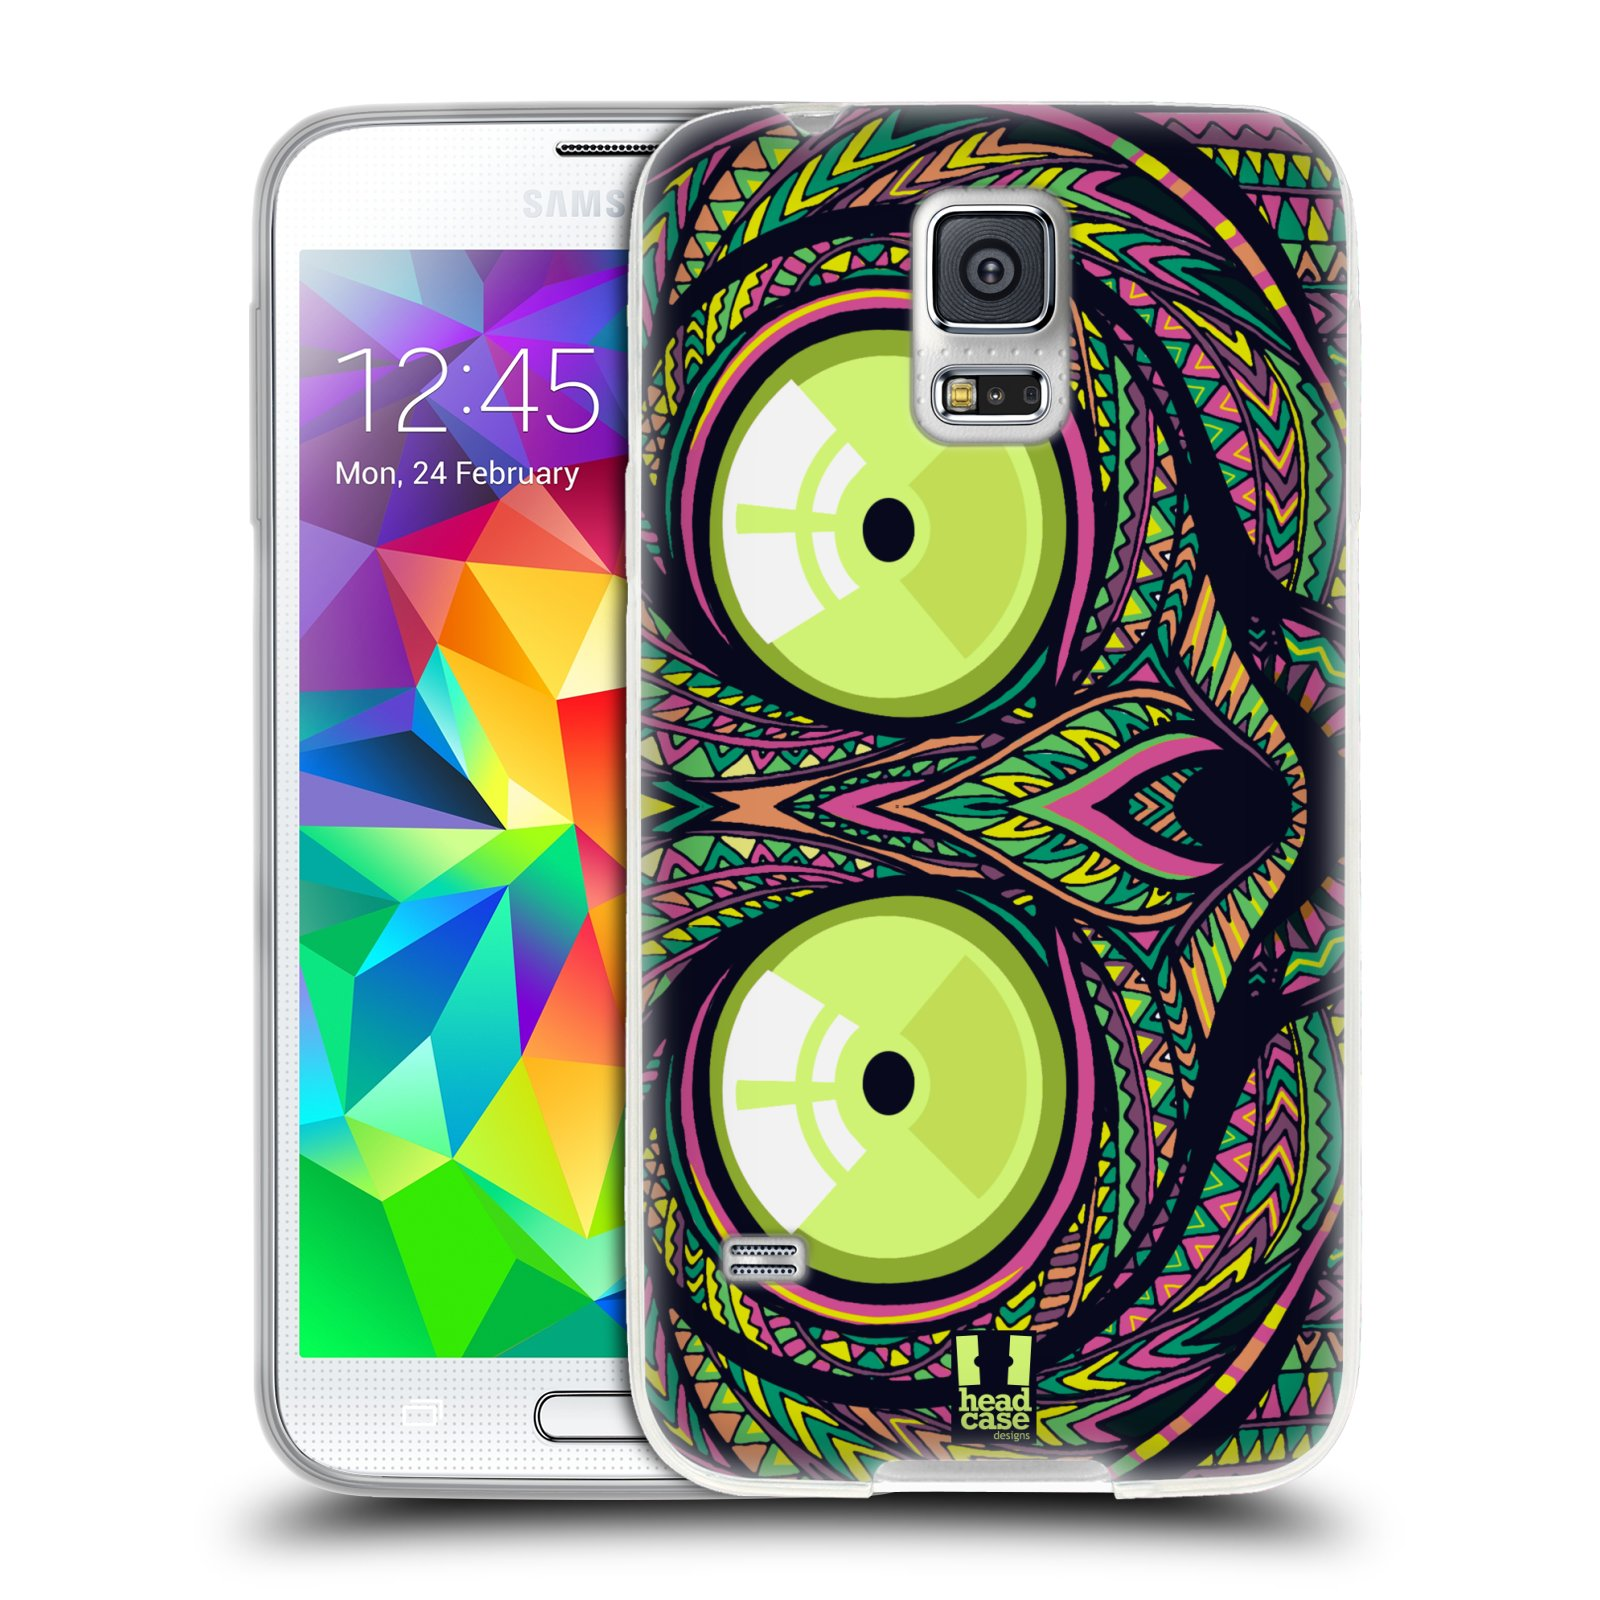 Silikonové pouzdro na mobil Samsung Galaxy S5 HEAD CASE AZTEC NÁRTOUN